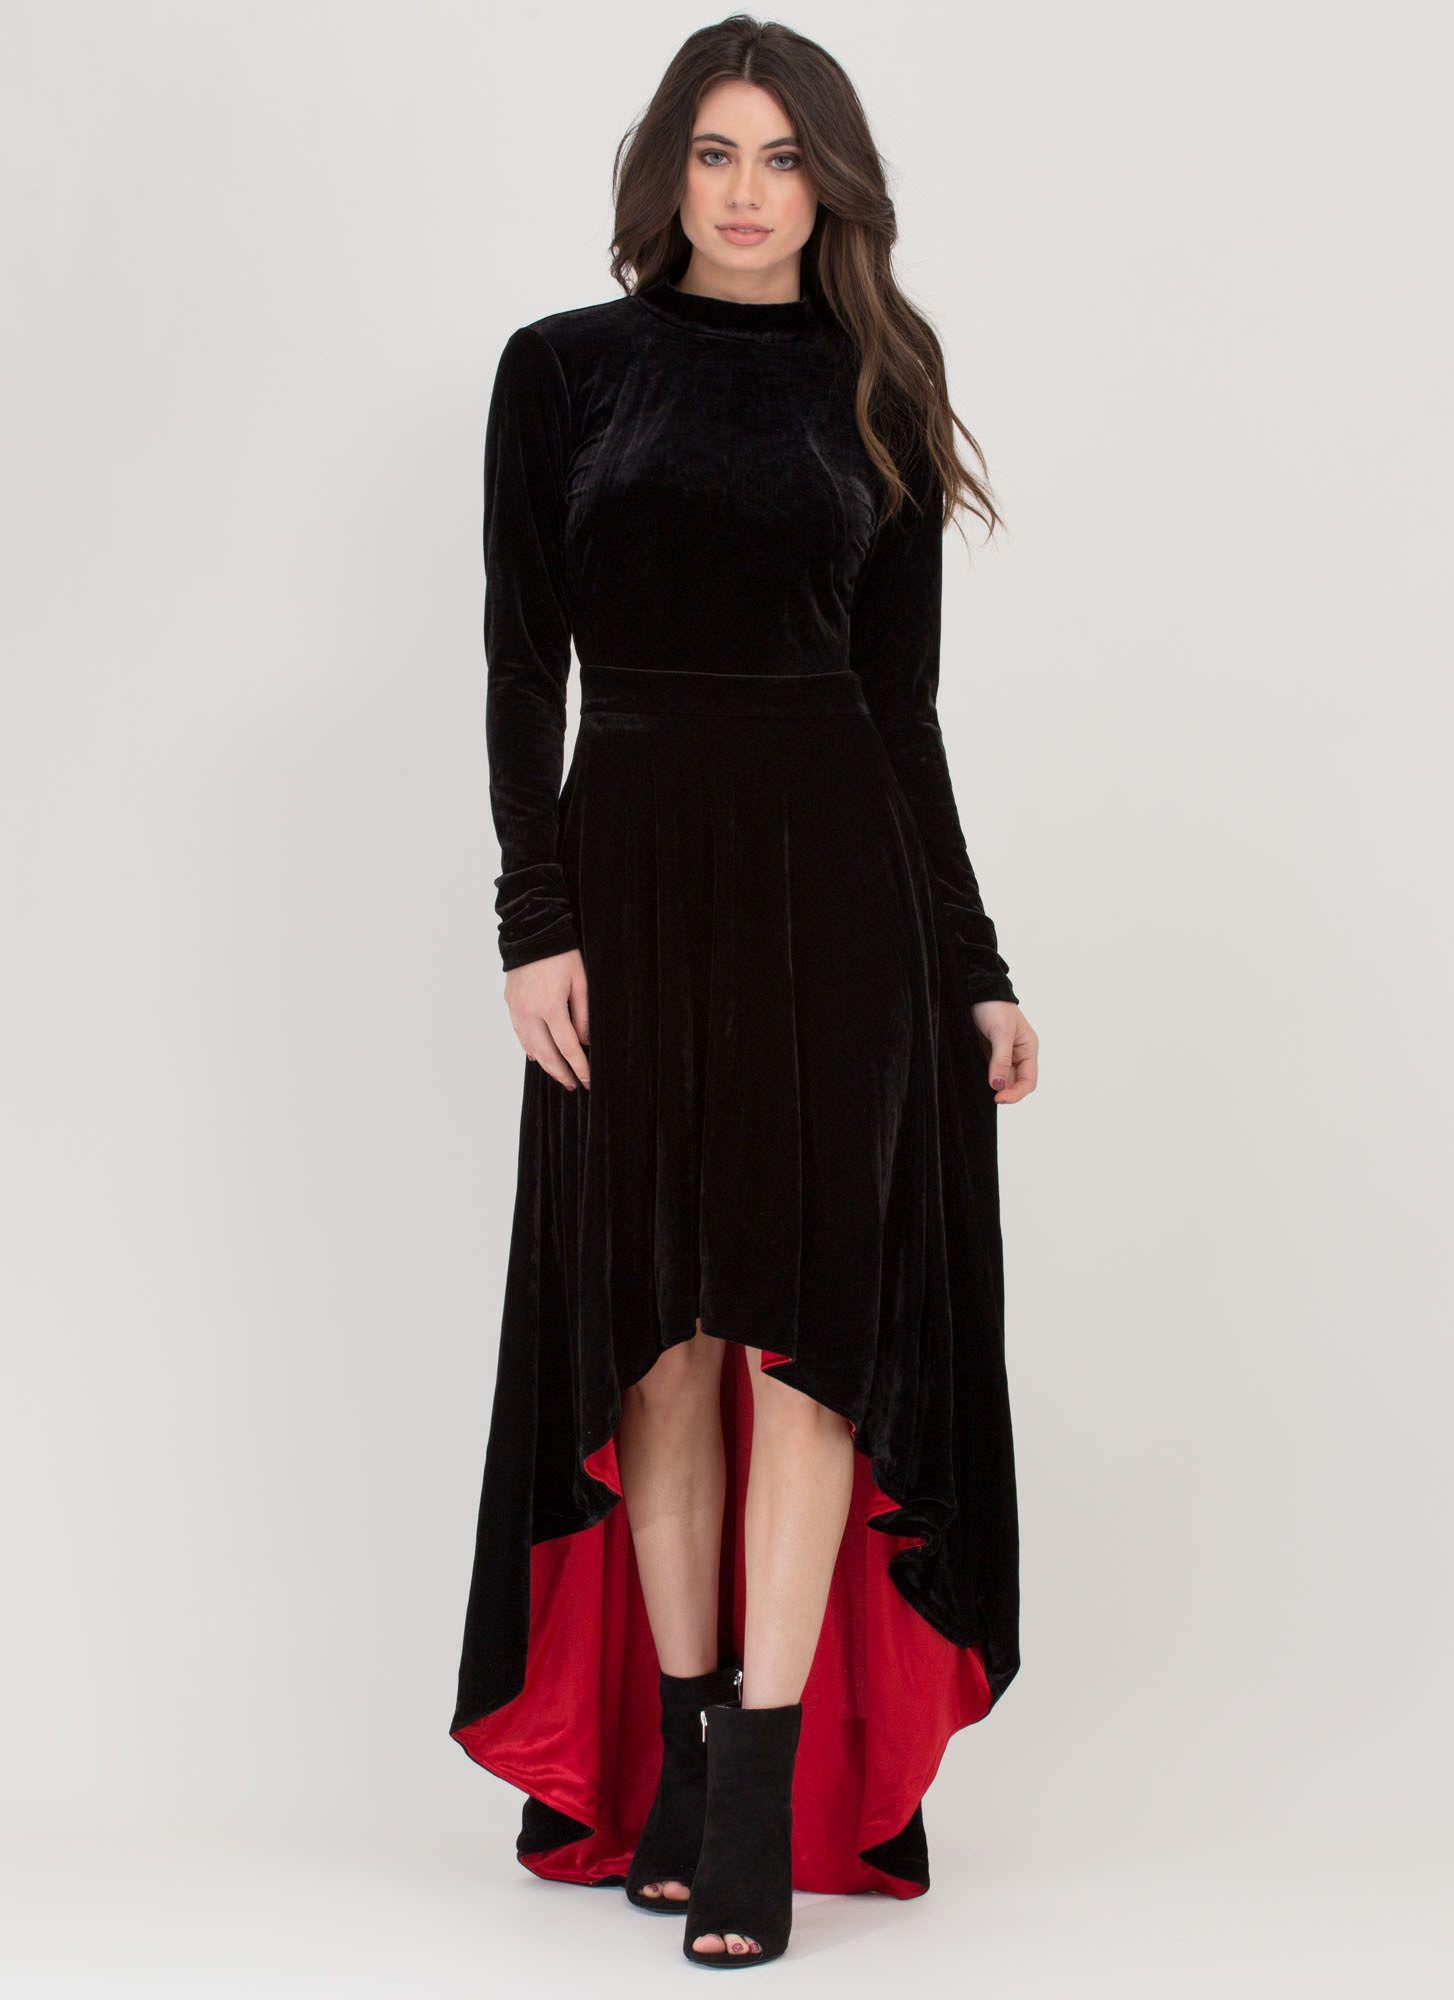 Velvet Kiss High Low Open Back Dress Black Gojane Com Long Sleeve High Low Dress Long Sleeve Evening Dresses Elegant Midi Dresses [ 2000 x 1454 Pixel ]